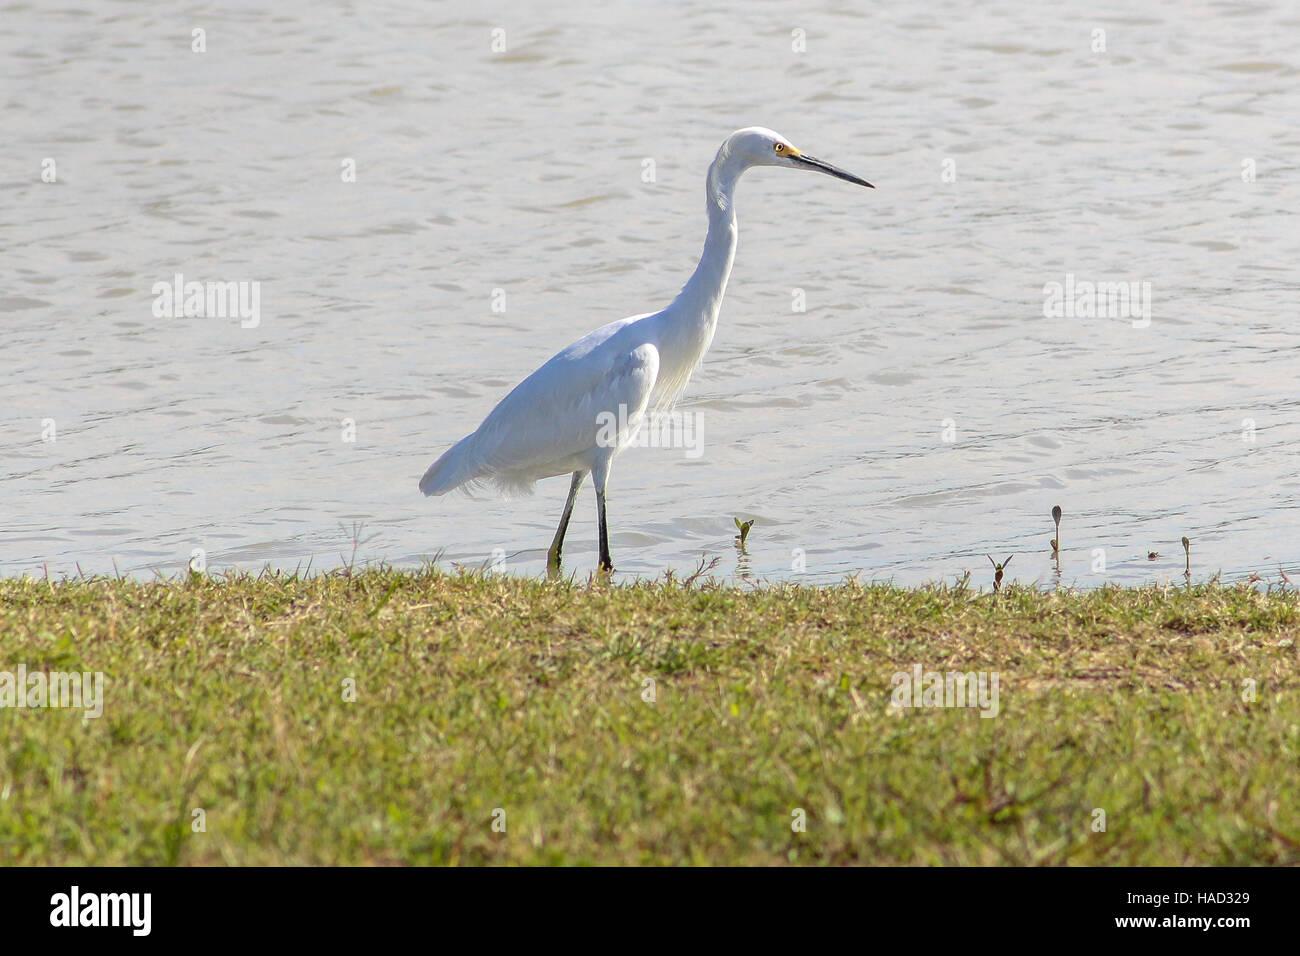 Egret, white egretta garzetta, wading a retention pond shoreline - Stock Image